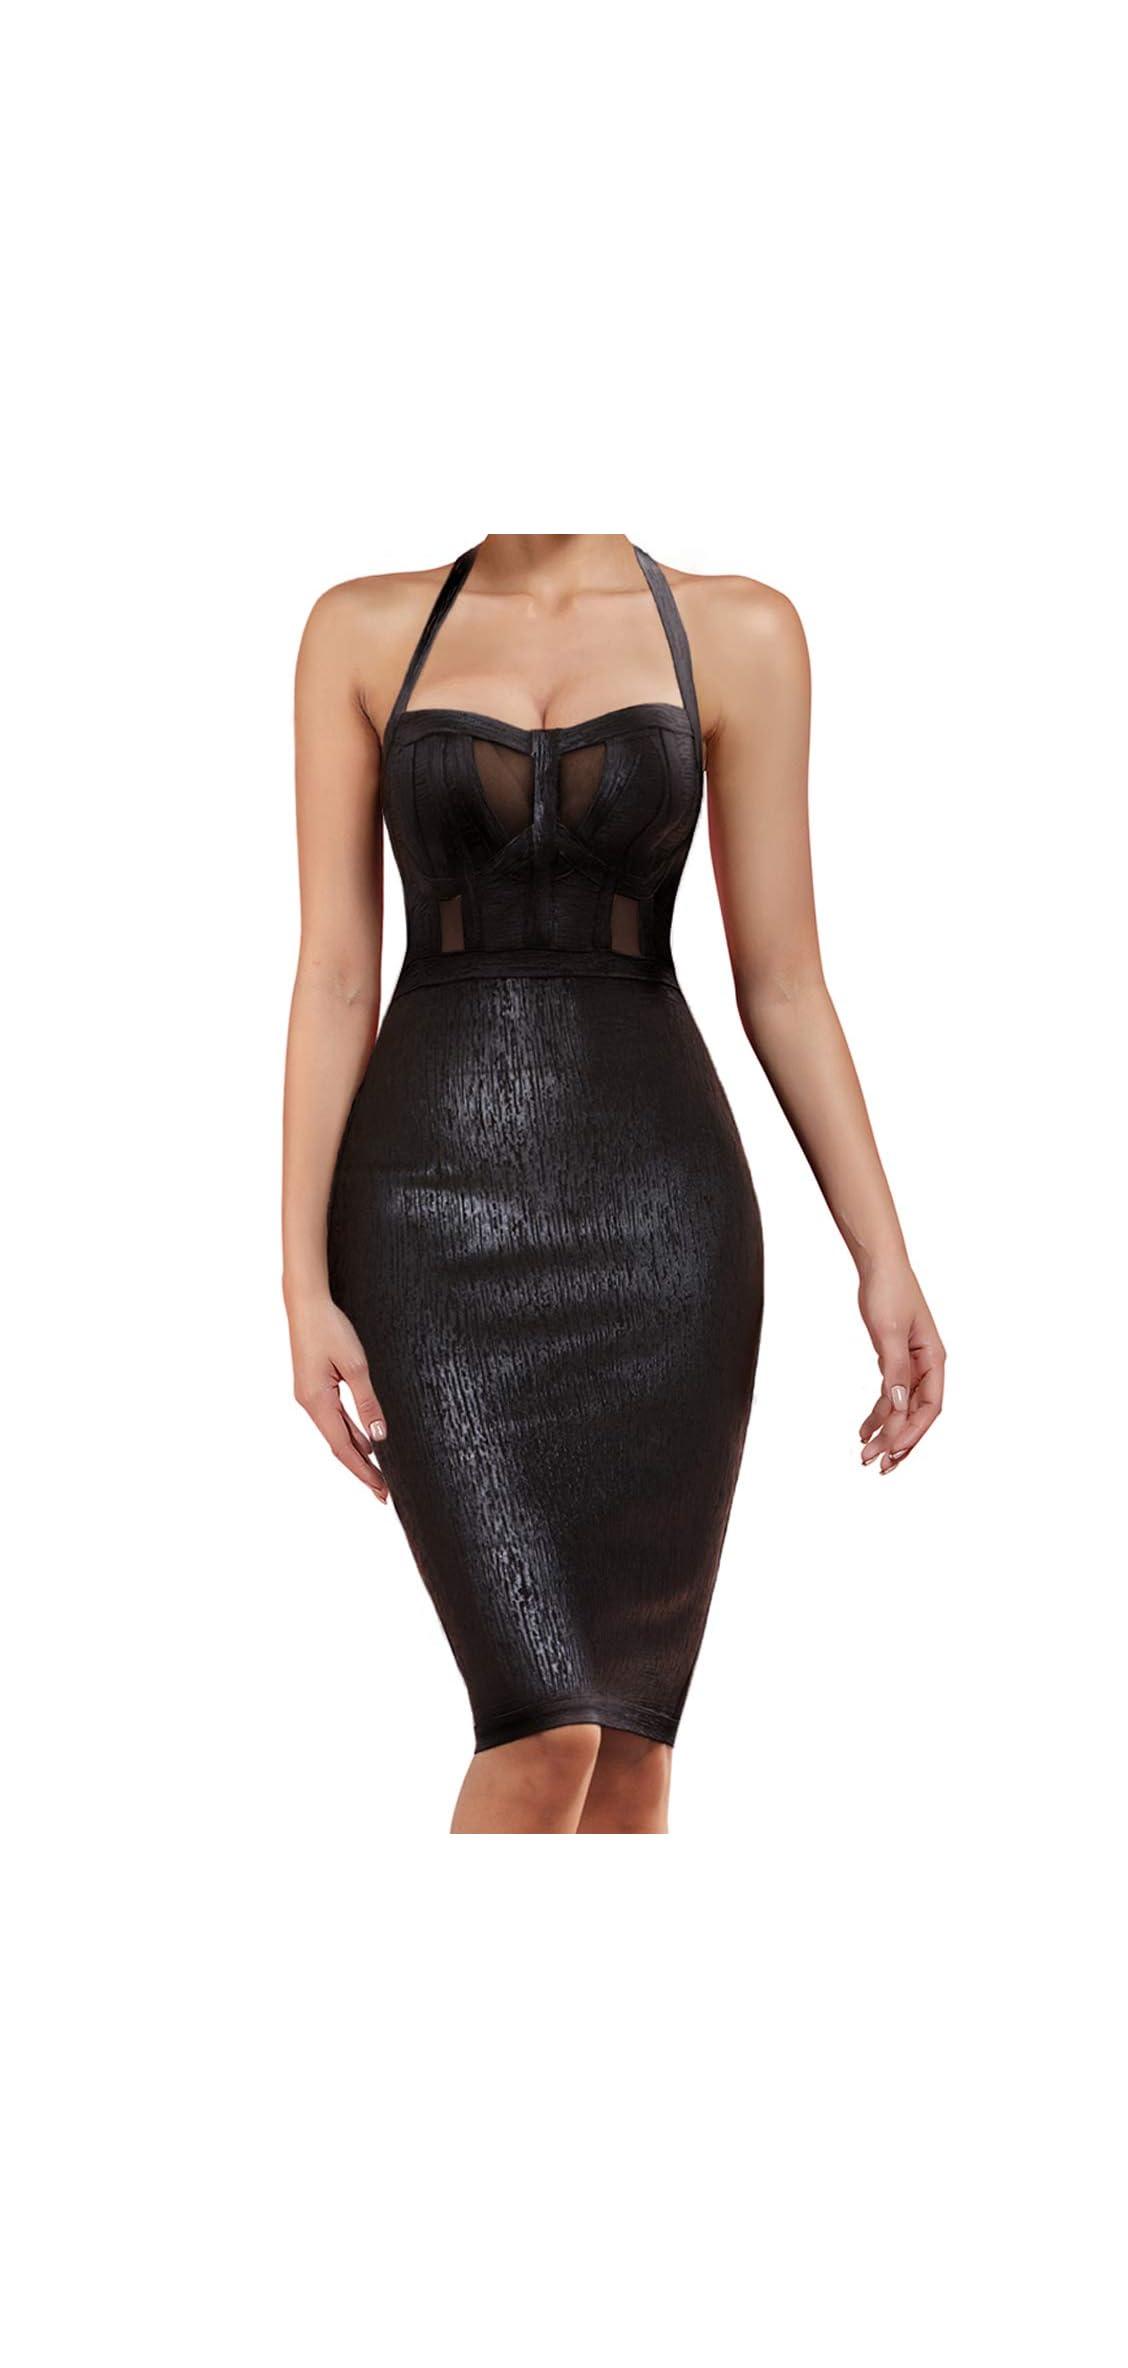 Women's Sexy Rayon Halter Strapless Foil Sheer Mesh Dress